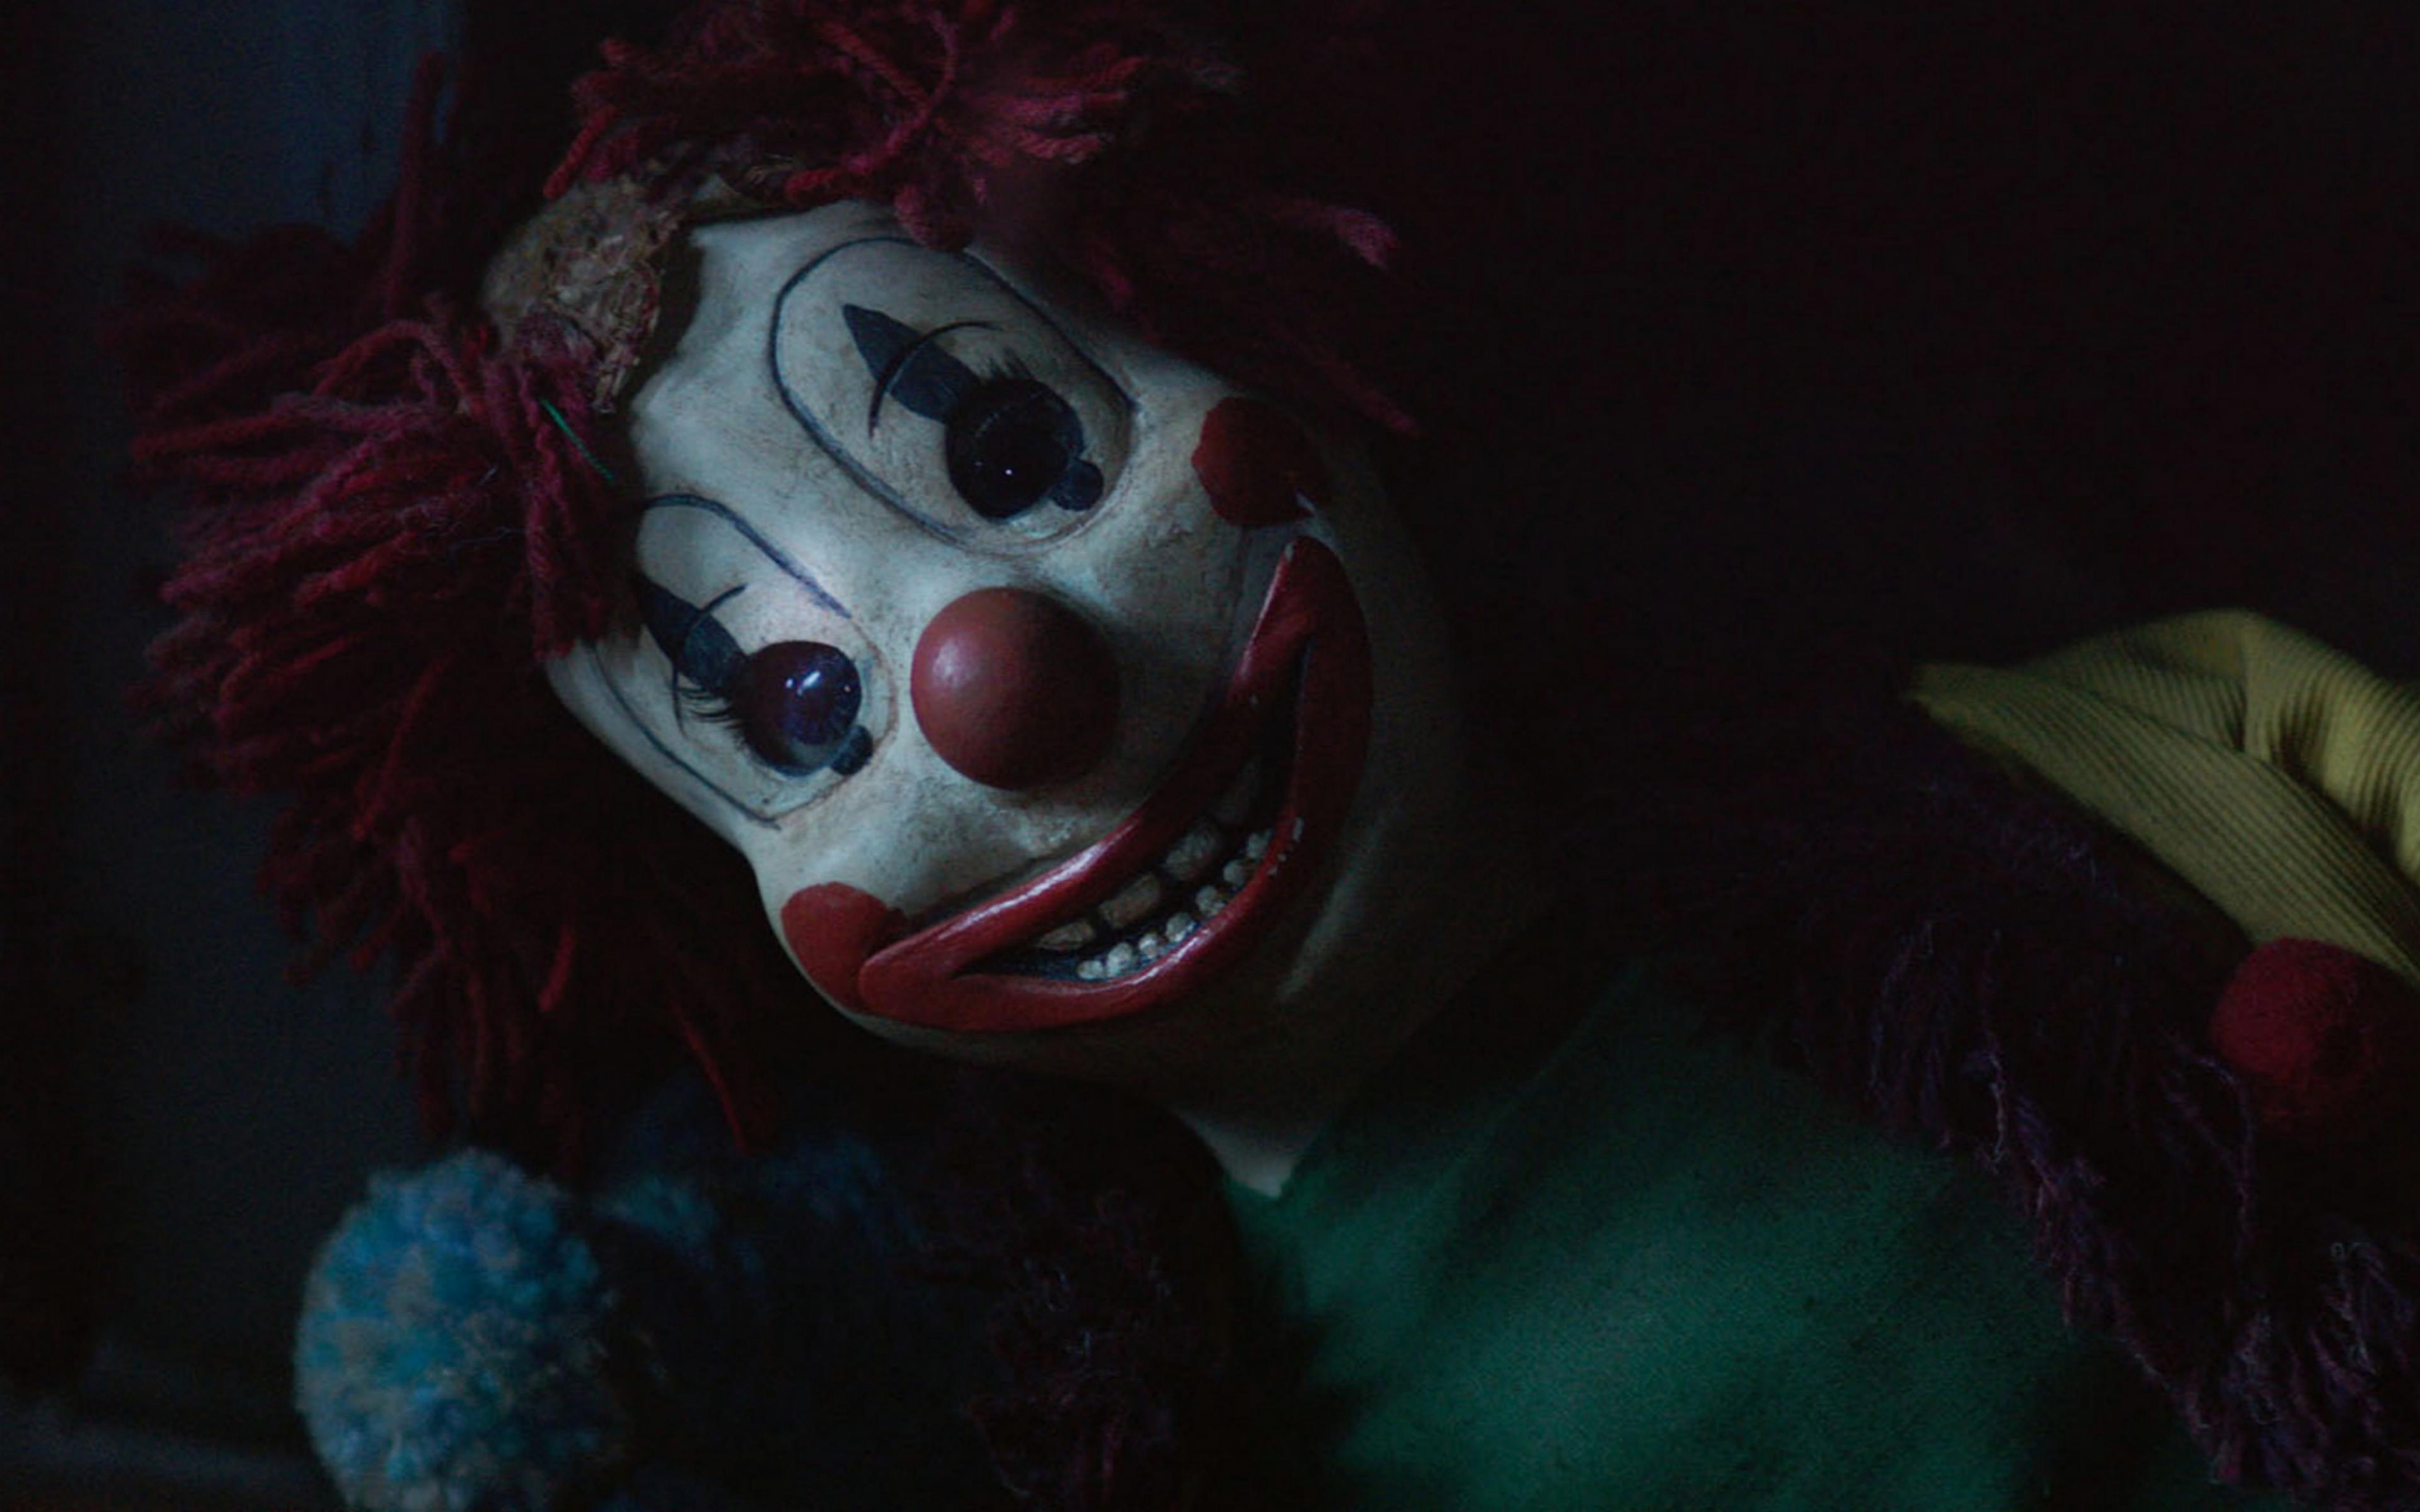 Pennywise Hintergrund: 會怕小丑都是這些電影害的啊~6部近10年來的恐怖小丑電影